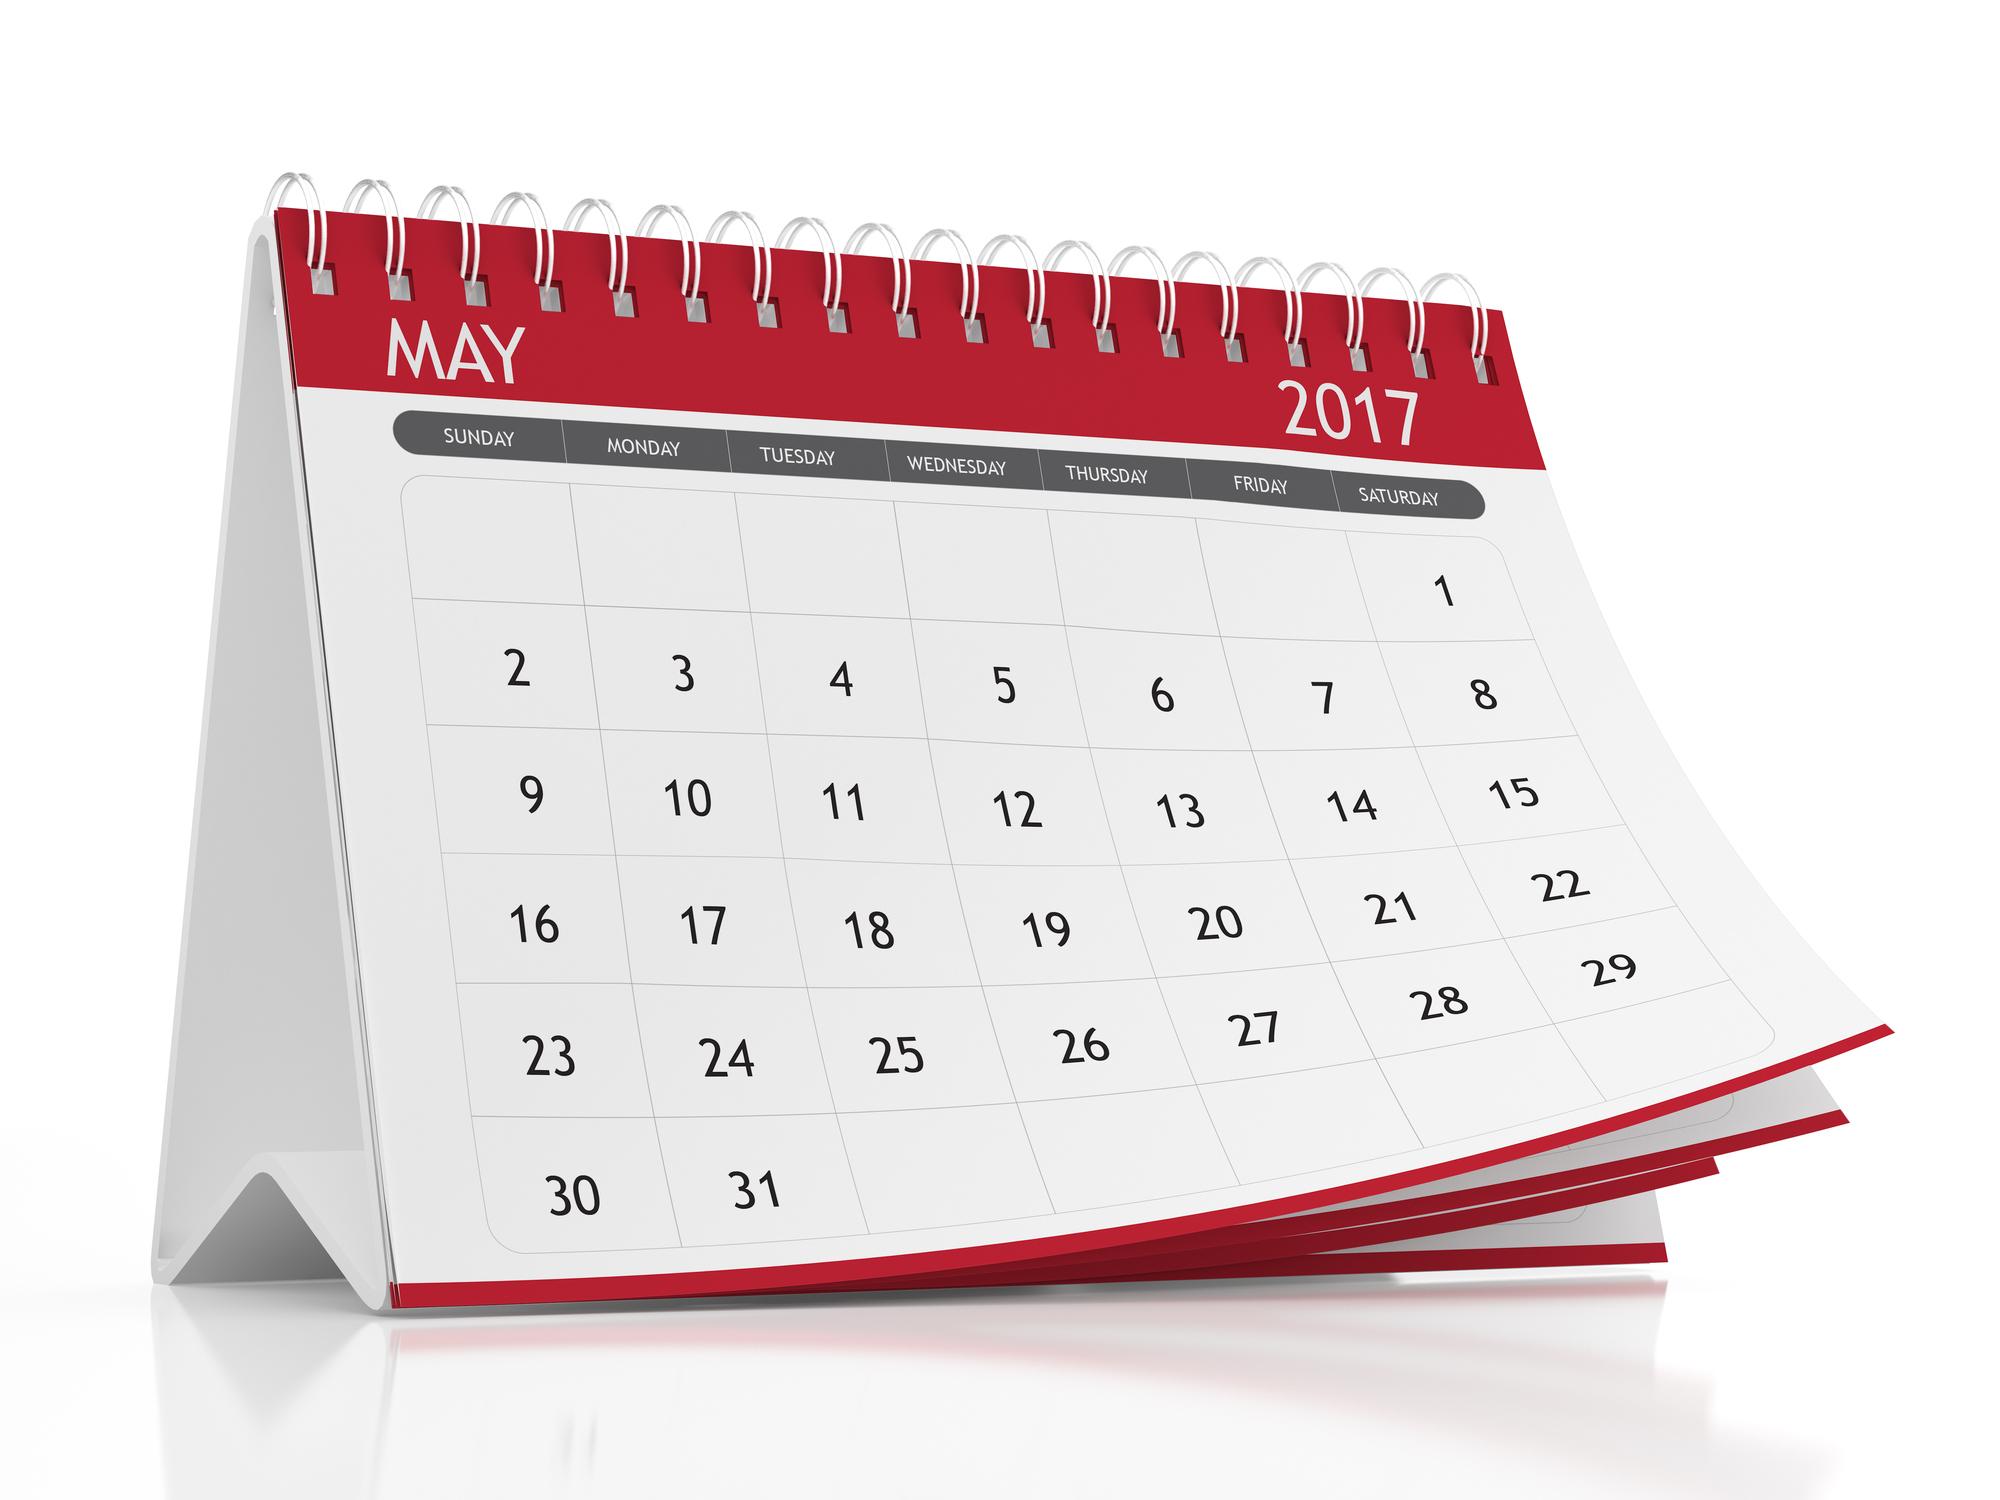 May 2017 desktop calendar